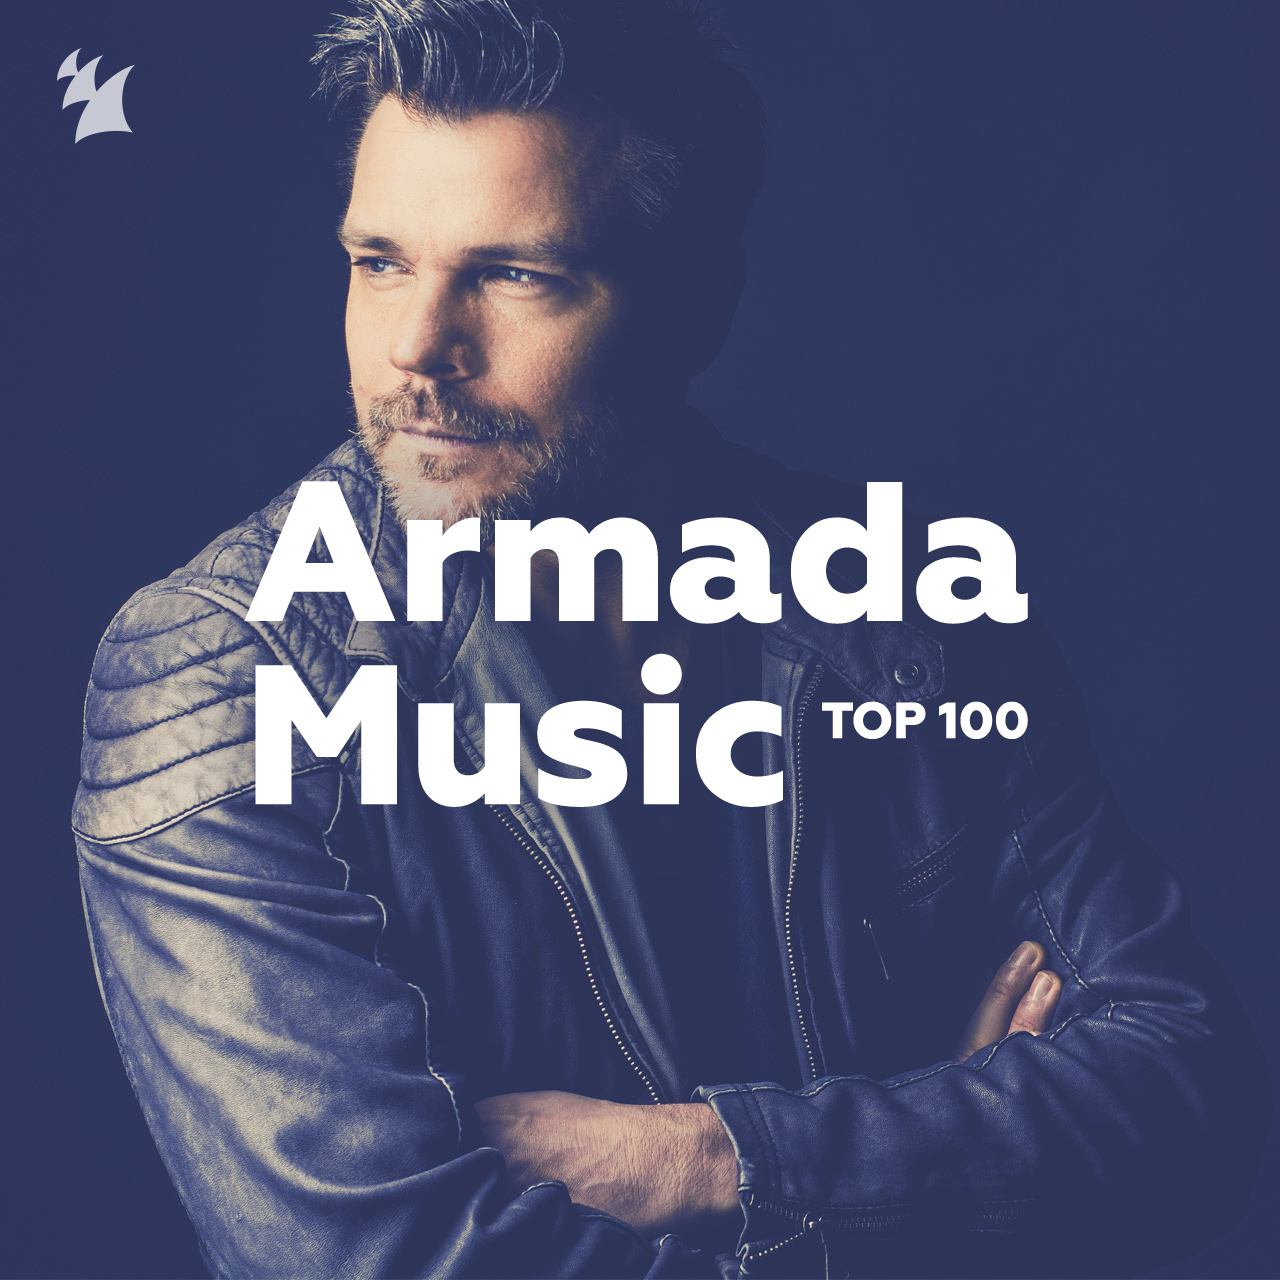 Armada Music Top 100